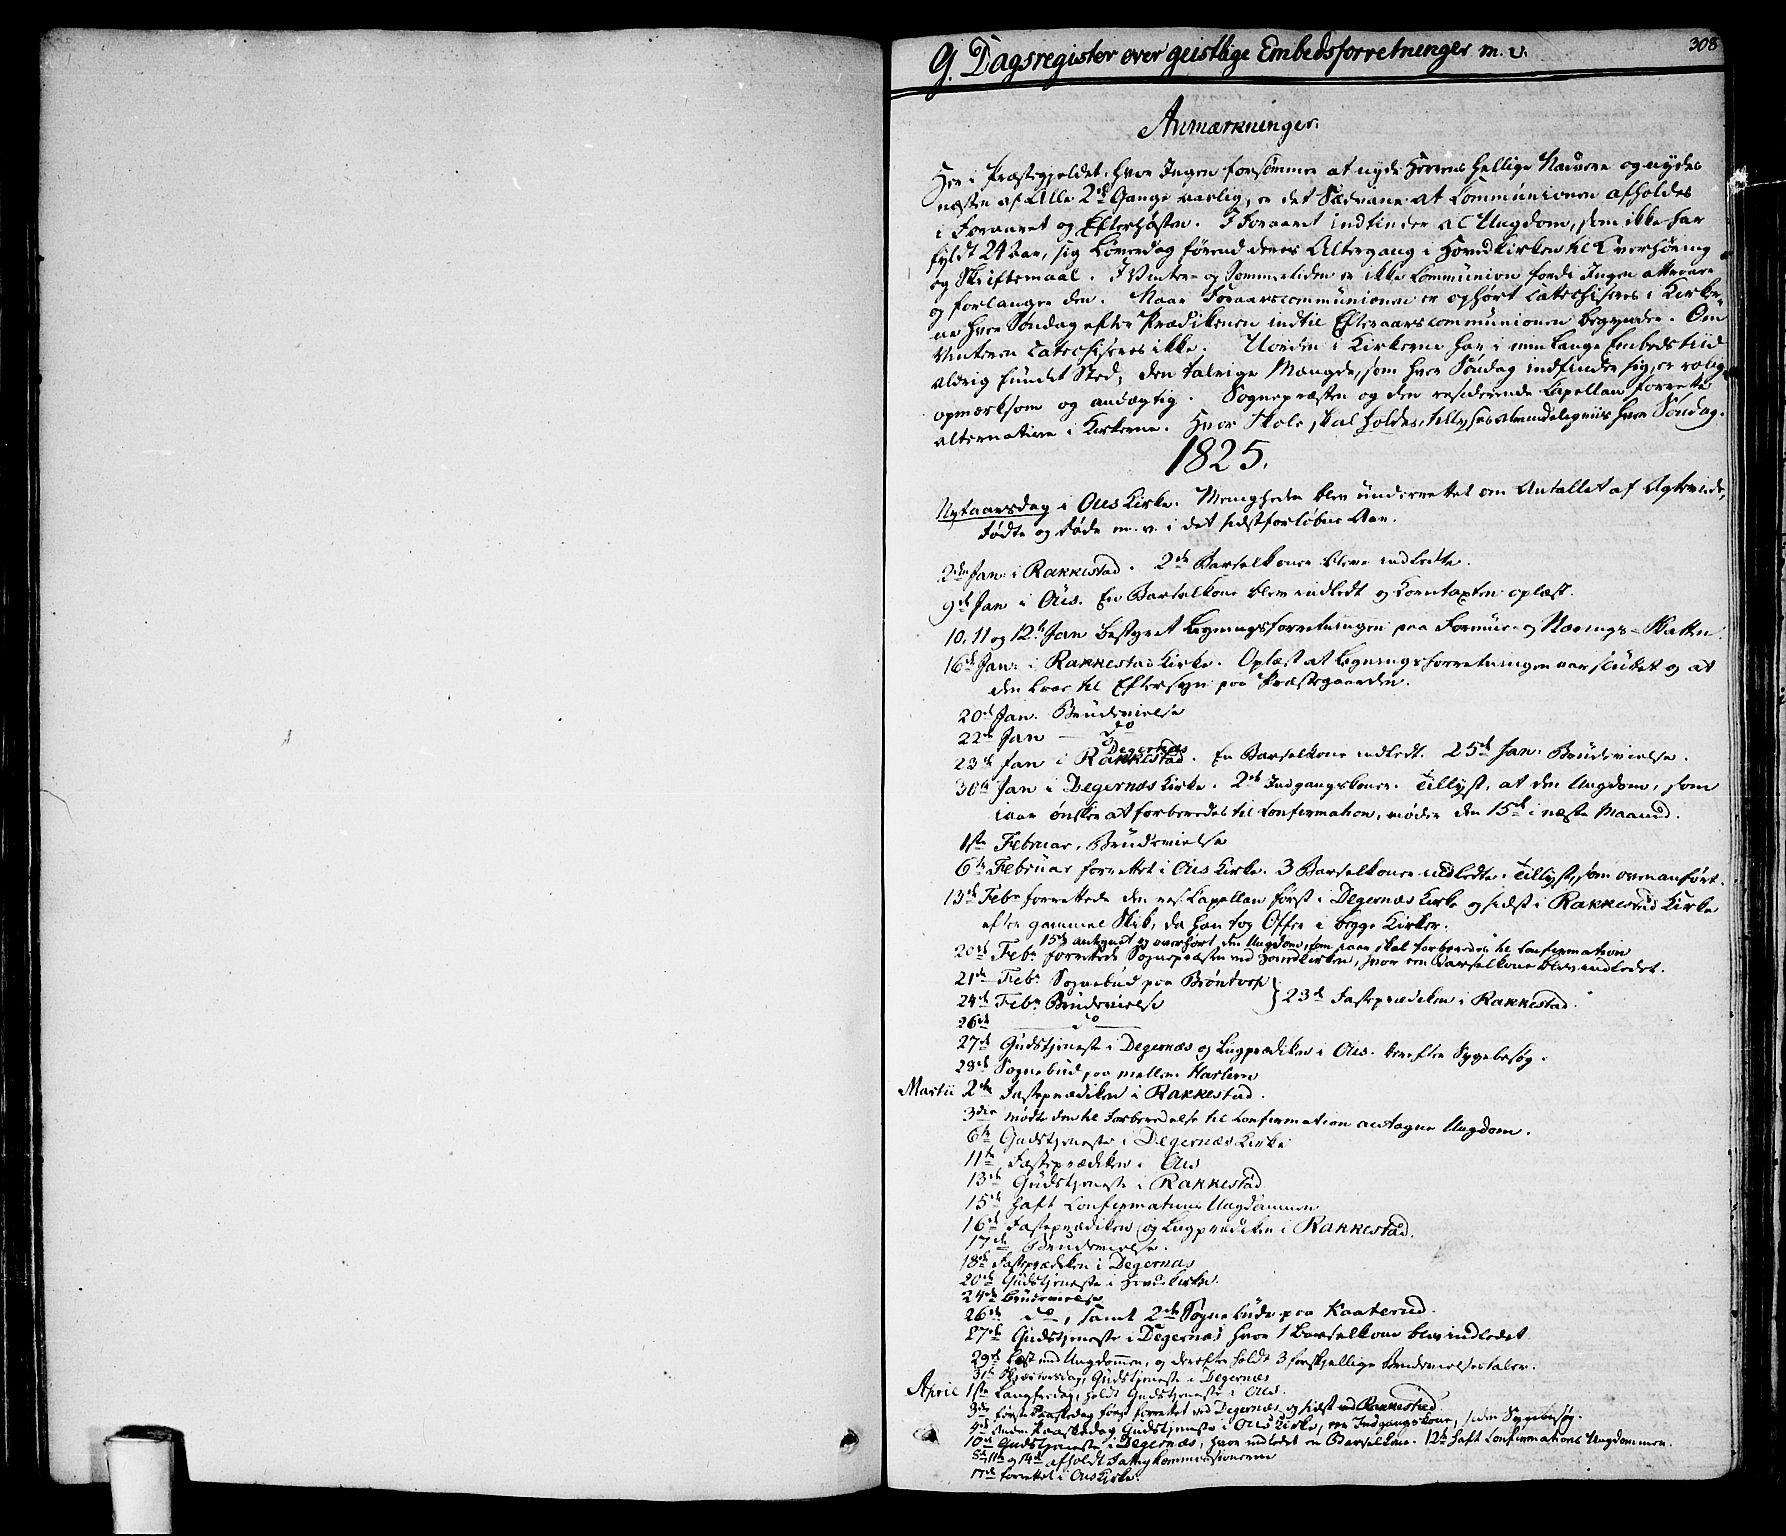 SAO, Rakkestad prestekontor Kirkebøker, F/Fa/L0007: Ministerialbok nr. I 7, 1825-1841, s. 308